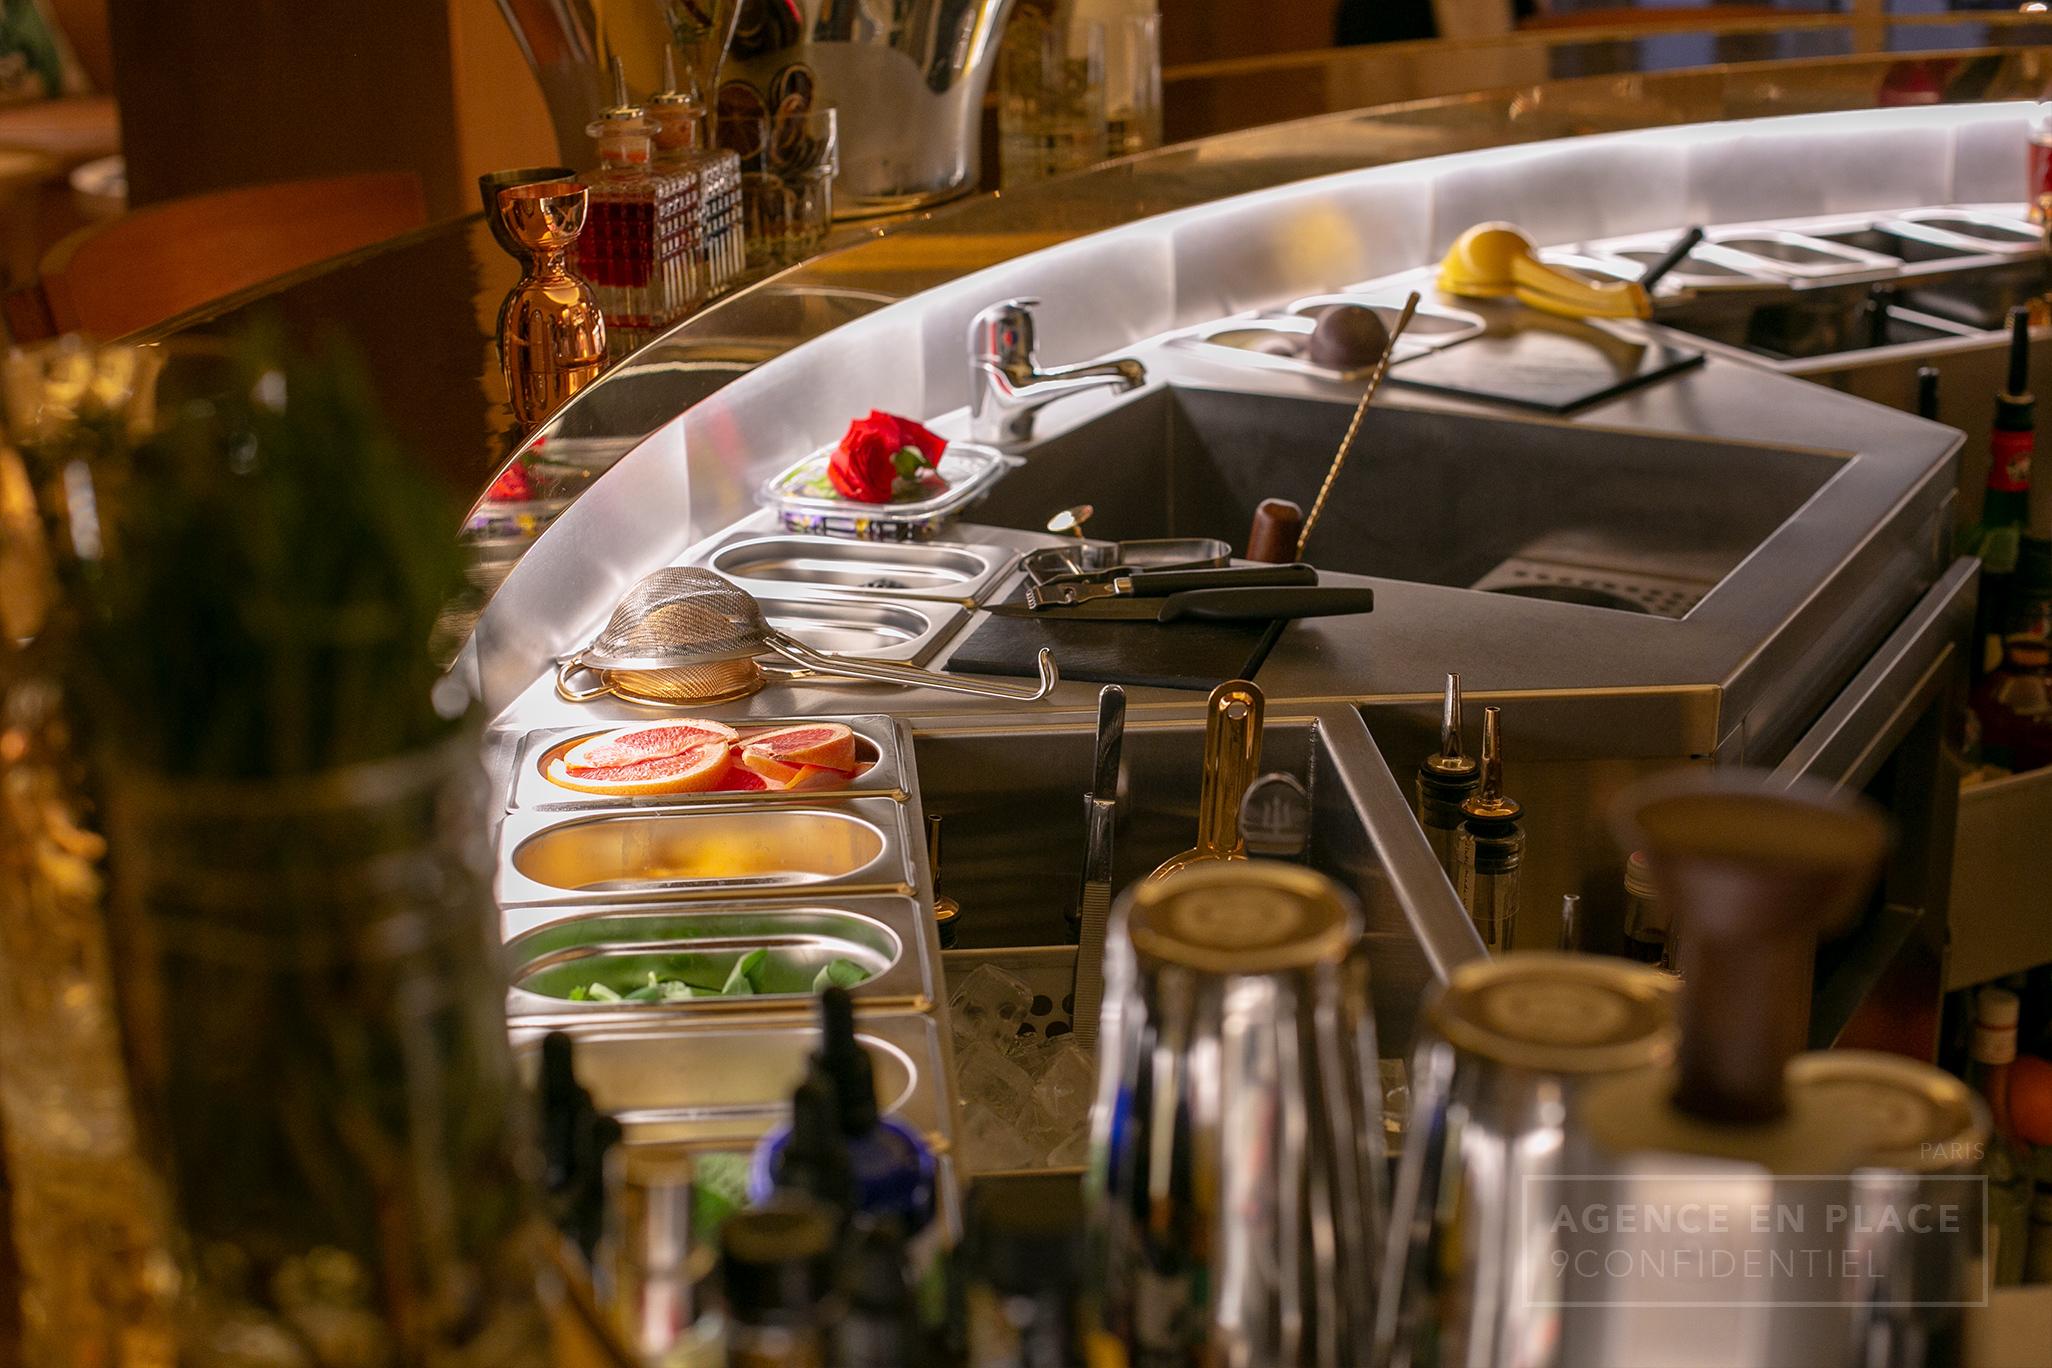 agence-en-place-9confidentiel-hotel-starck-cocktails-005